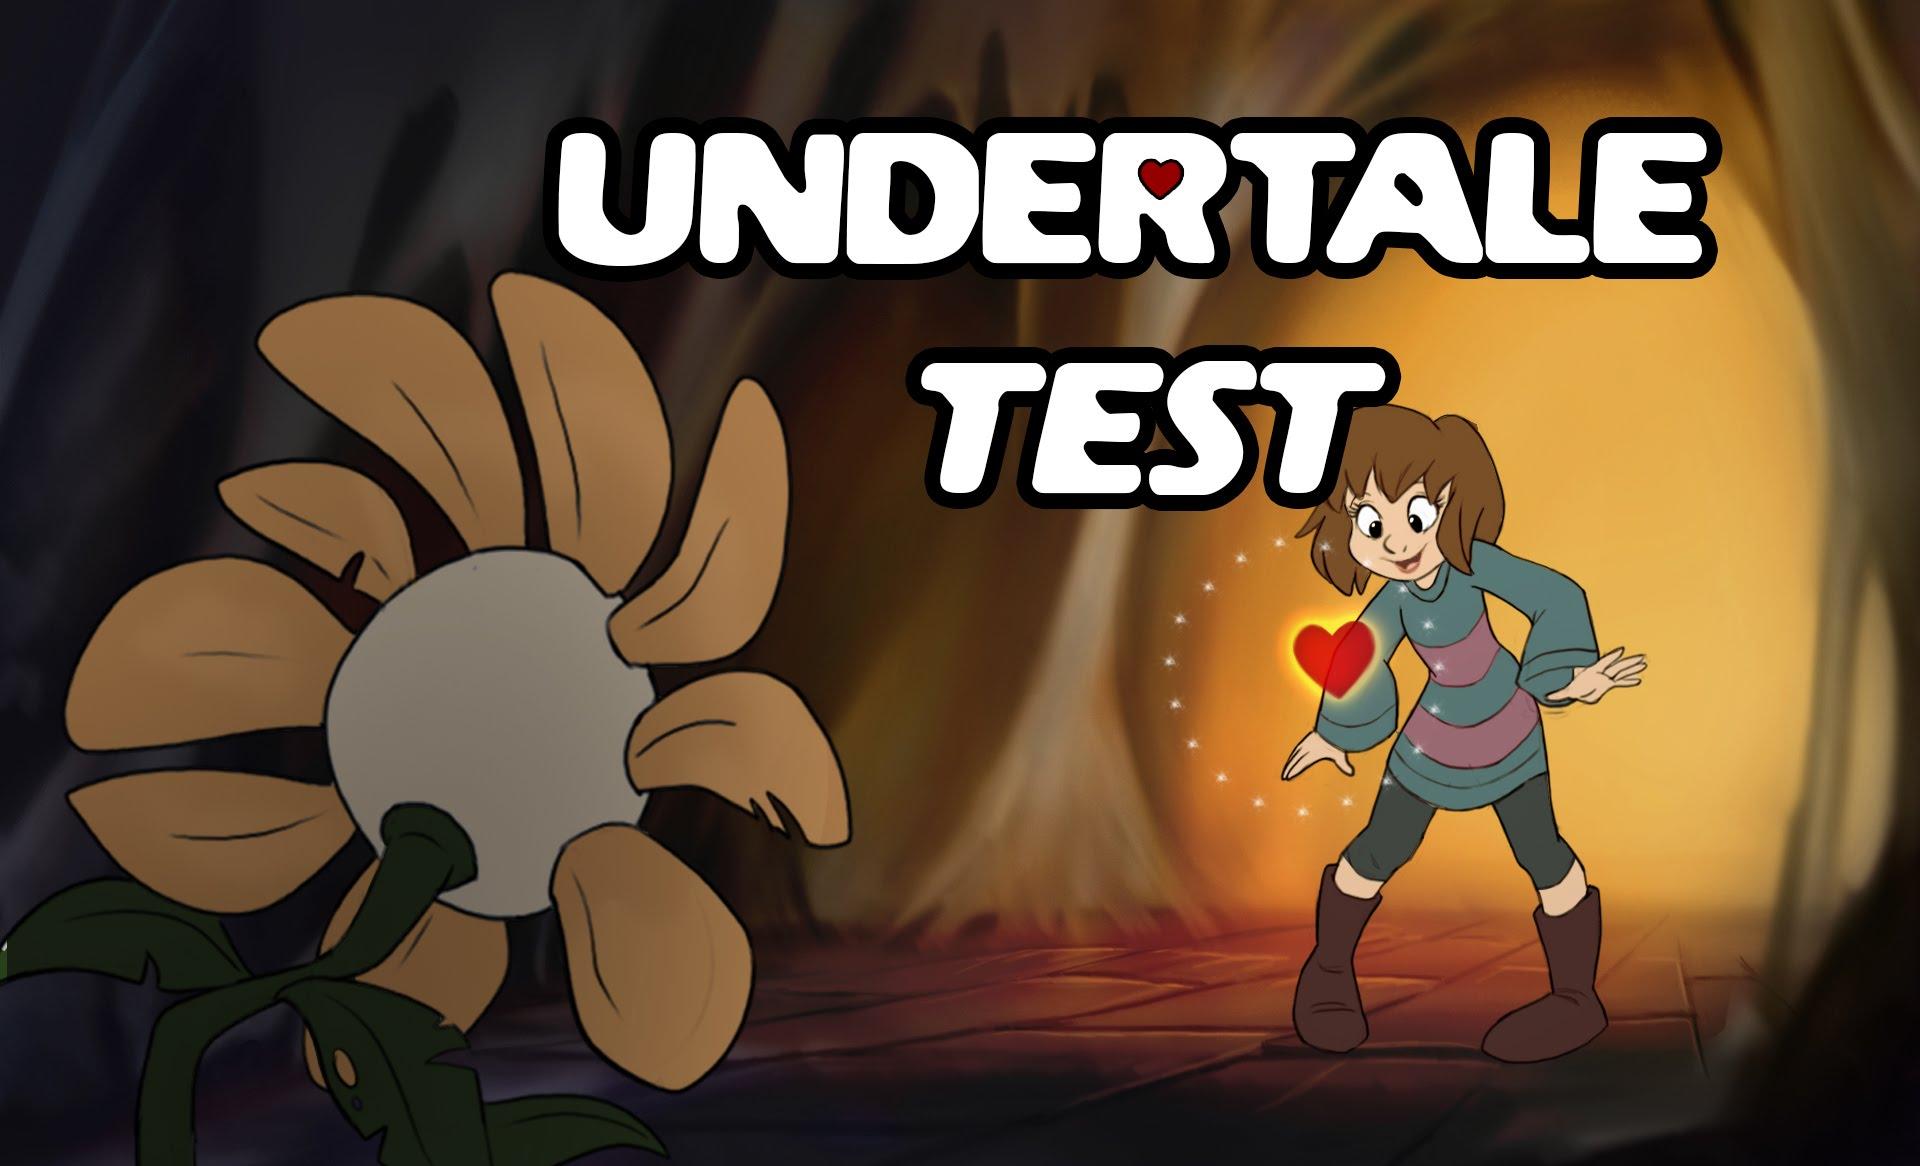 test de undertale